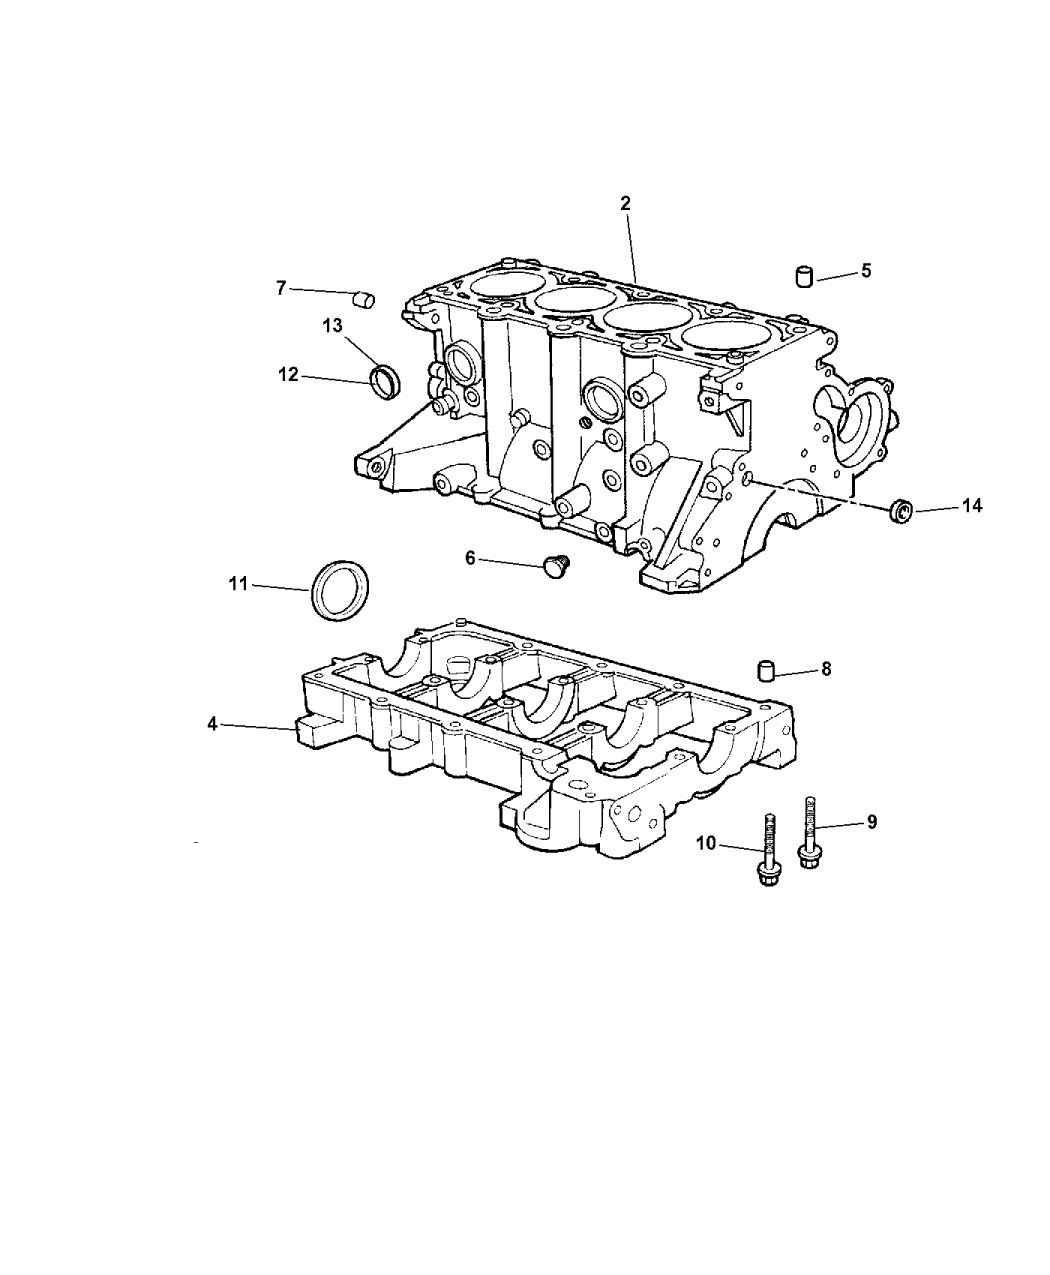 2006 Jeep Wrangler Cylinder Block - Thumbnail 1